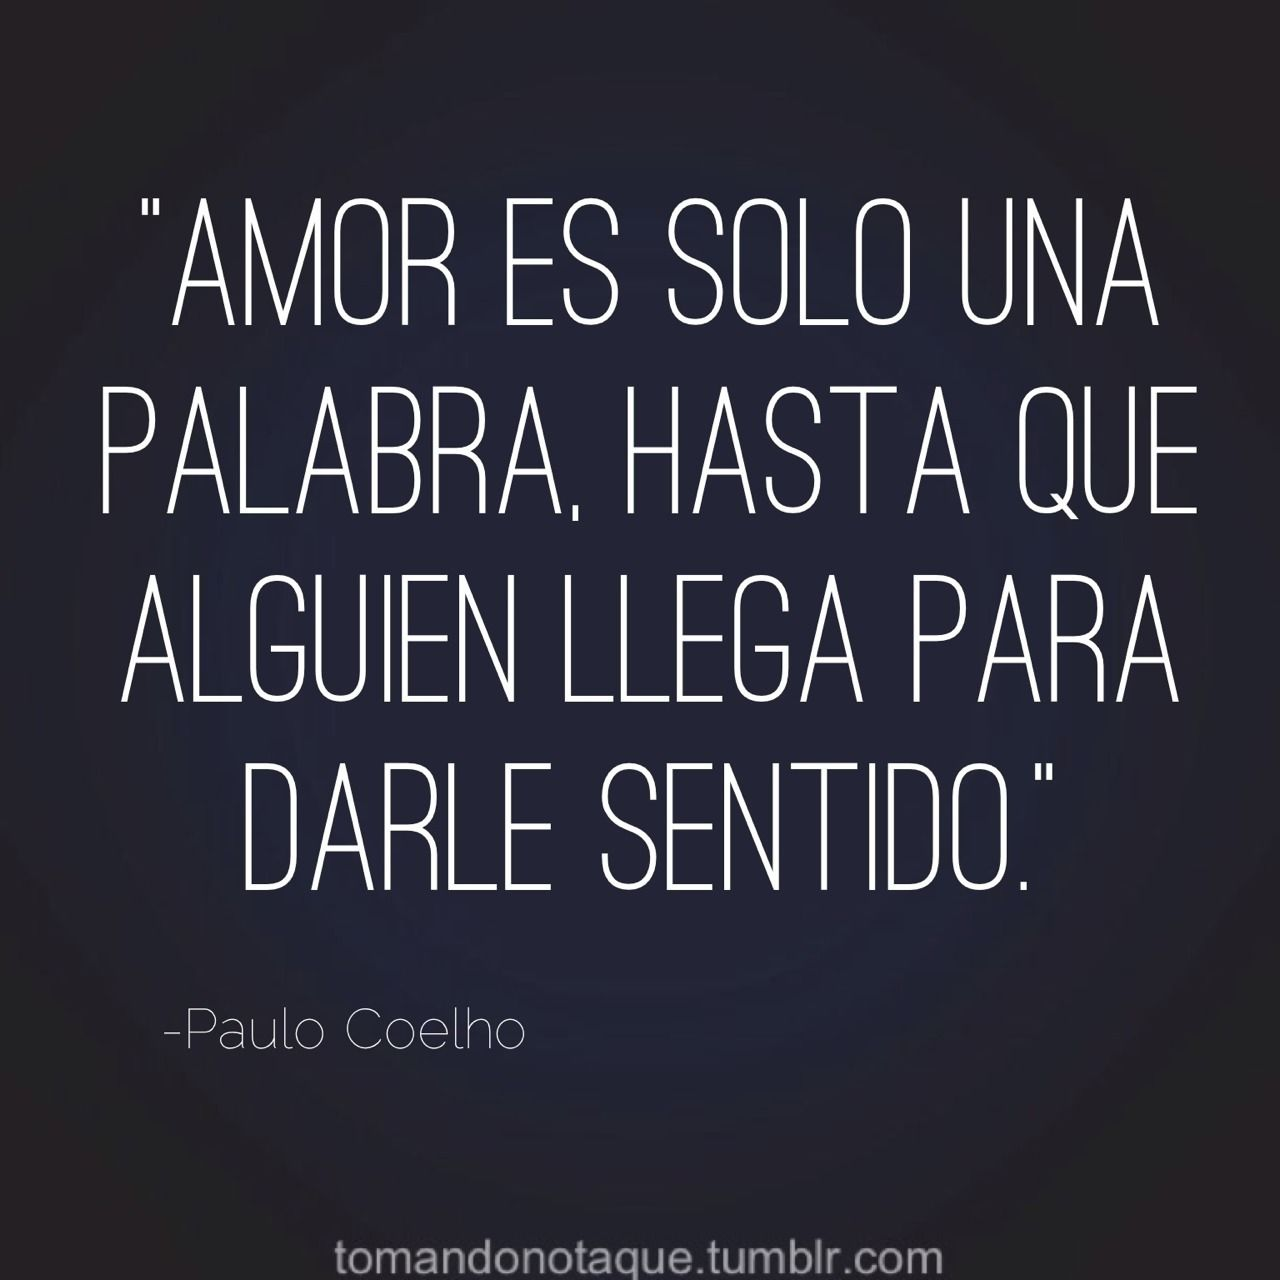 Frase Celebre De Amor De Paulo Coelho Quotes Pinterest Love